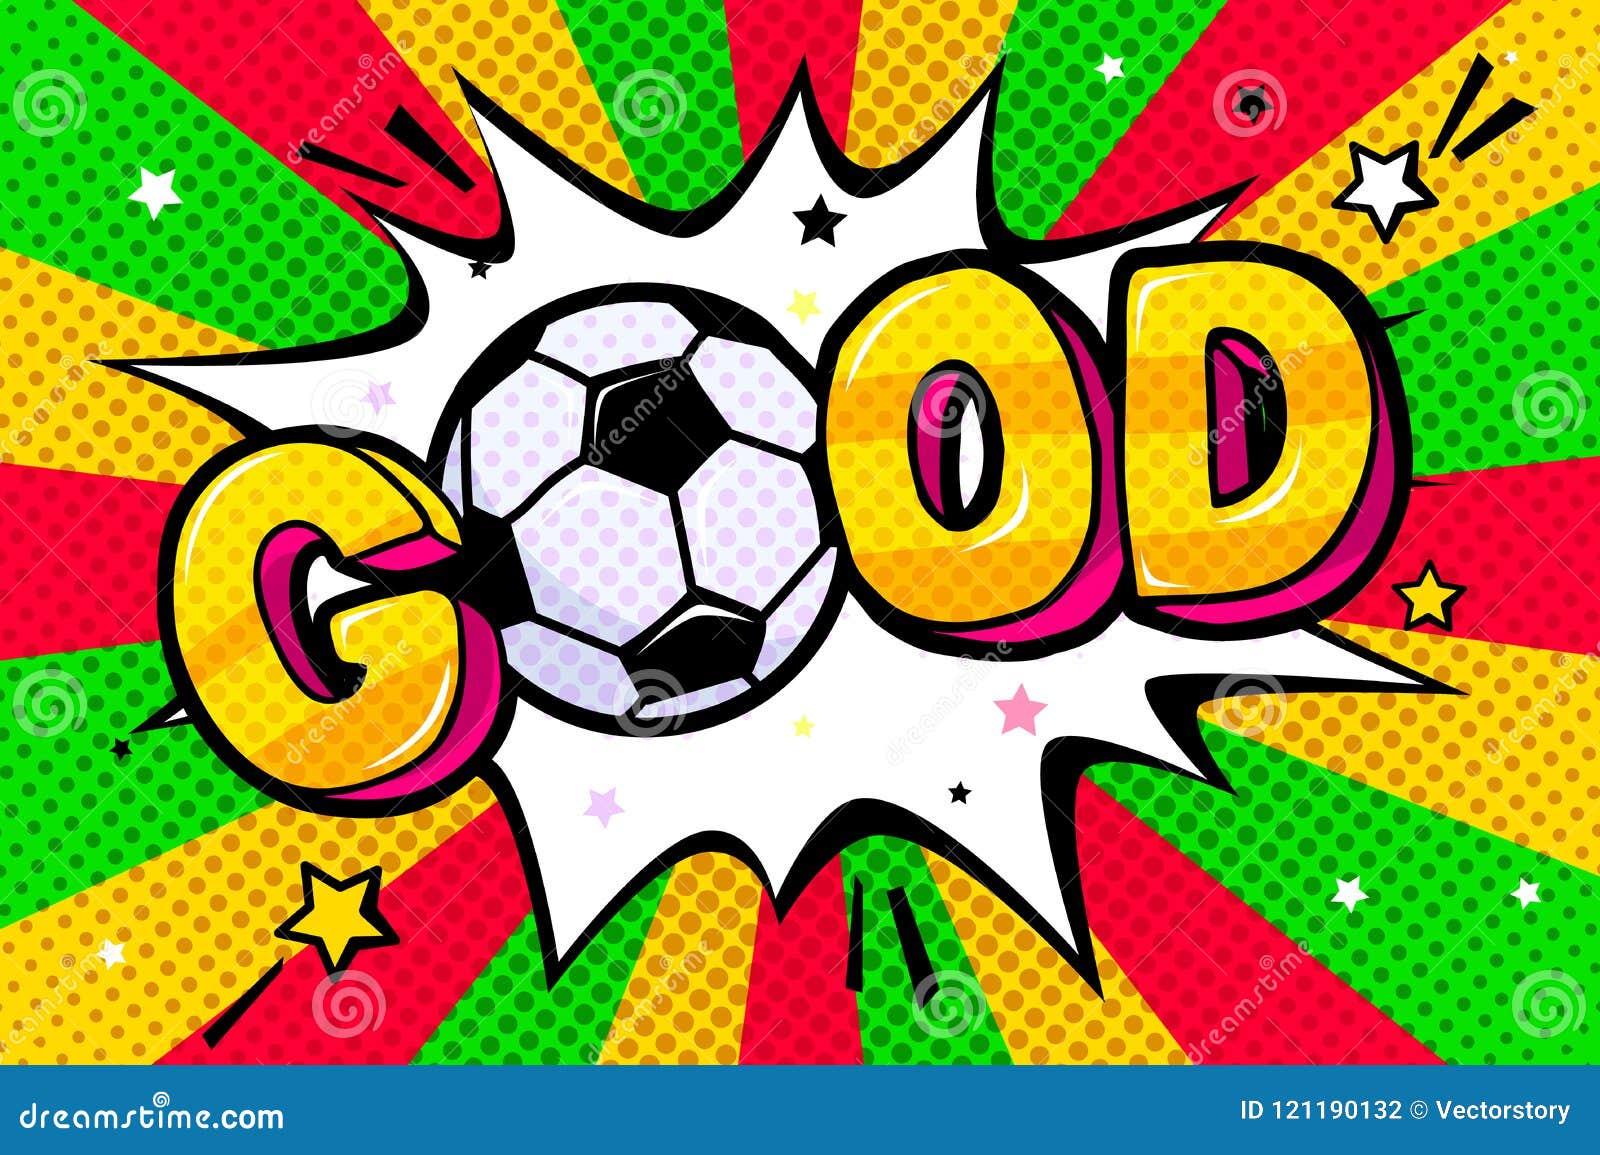 Soccer Concept In Pop Art Style Stock Vector Illustration Of